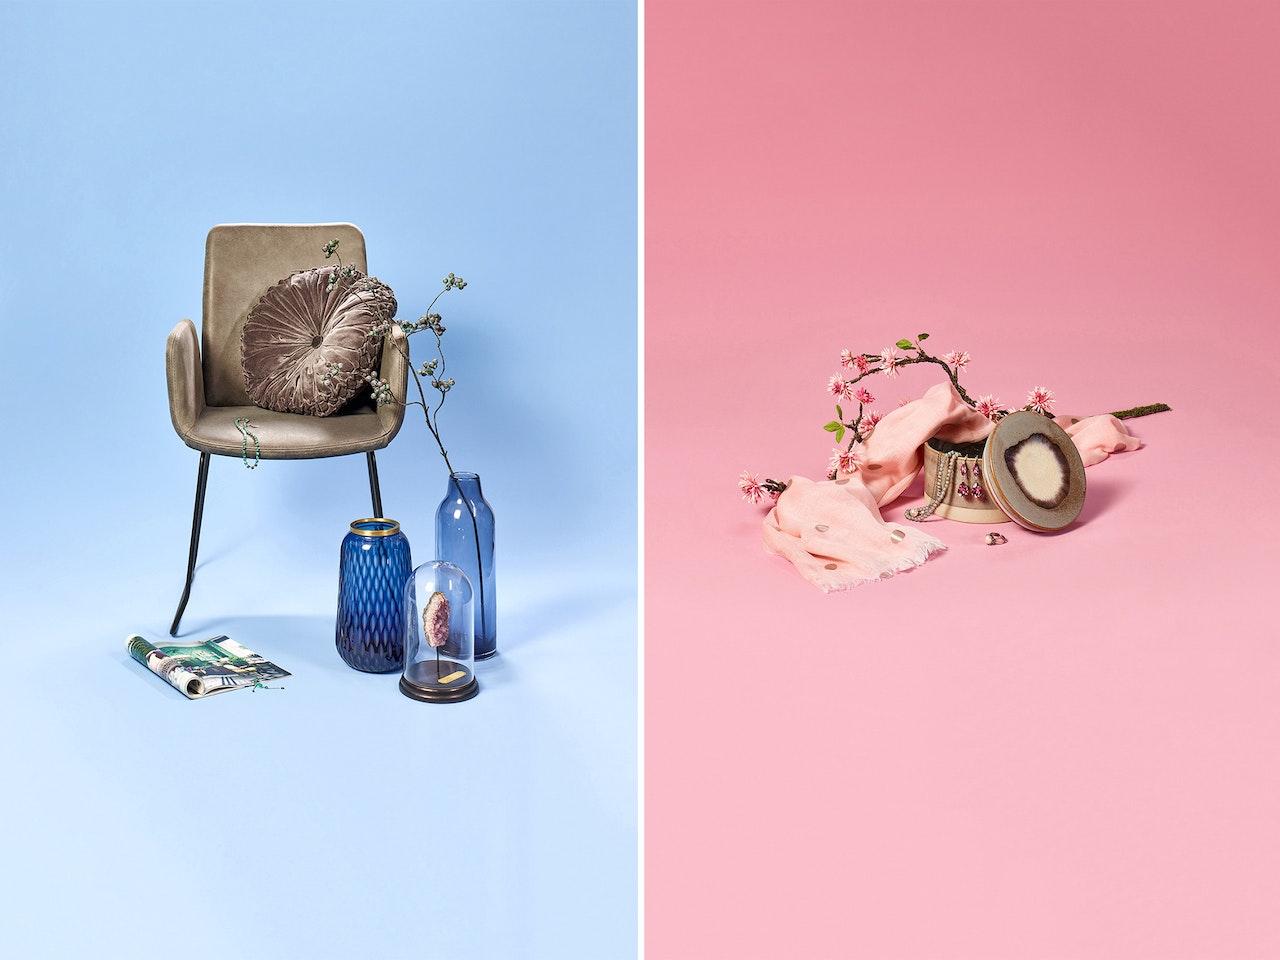 Ads - Tendence 18 - Messe Frankfurt  /  Agency: Burn the Bunny